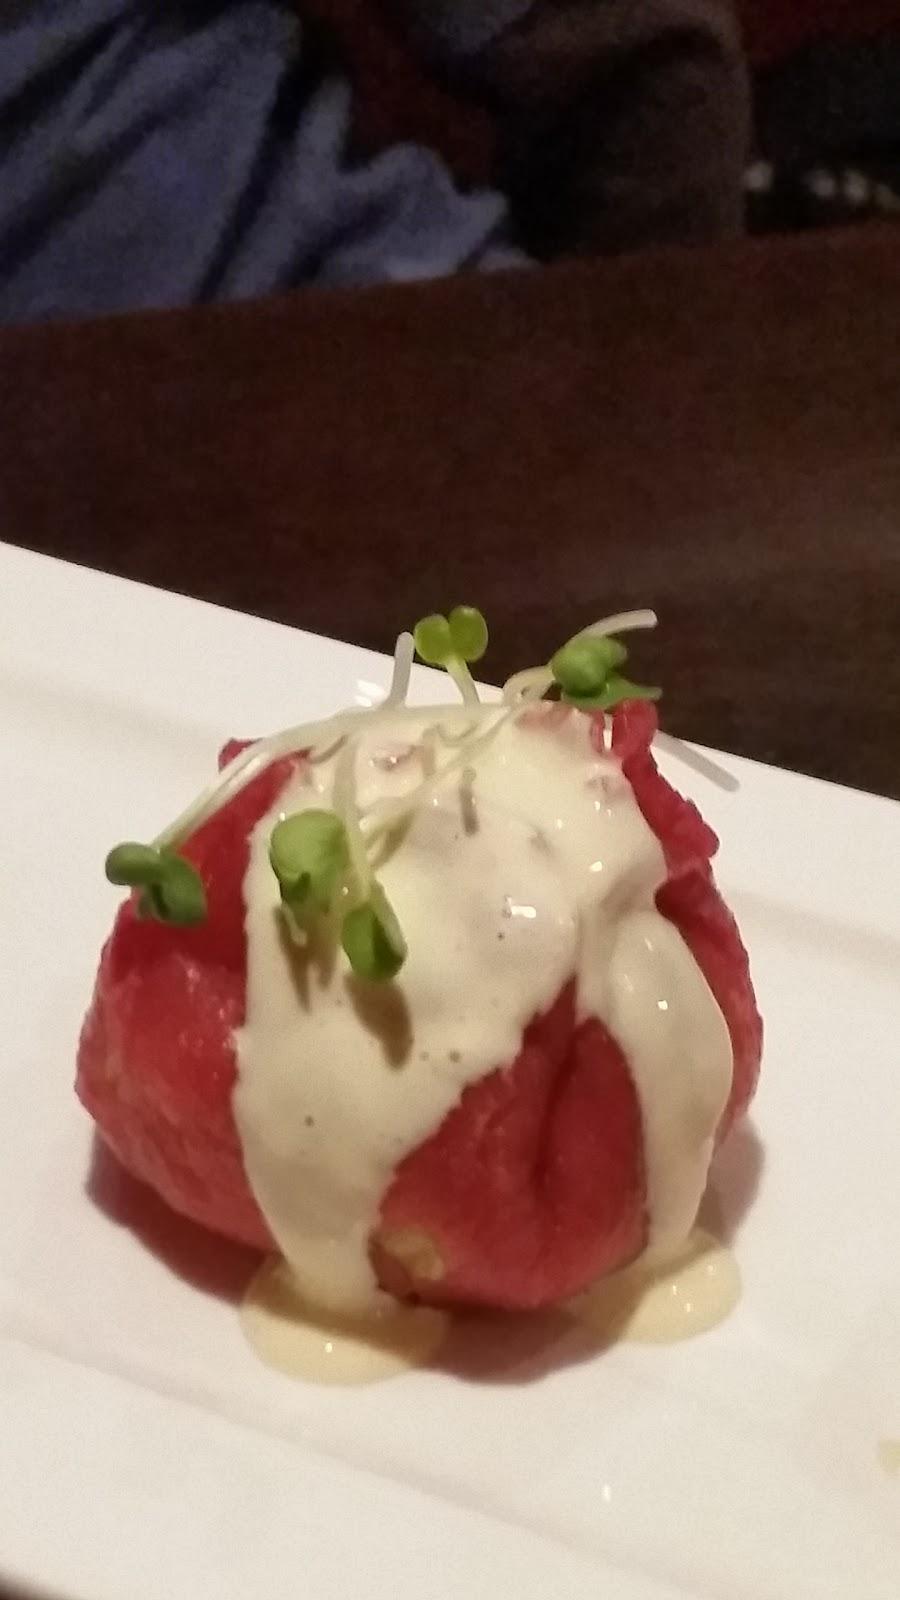 Blossom Asian Bistro - restaurant  | Photo 9 of 10 | Address: Packanack Shopping Center 1490 Rt 23 N, Wayne, NJ 07470, USA | Phone: (973) 628-9020